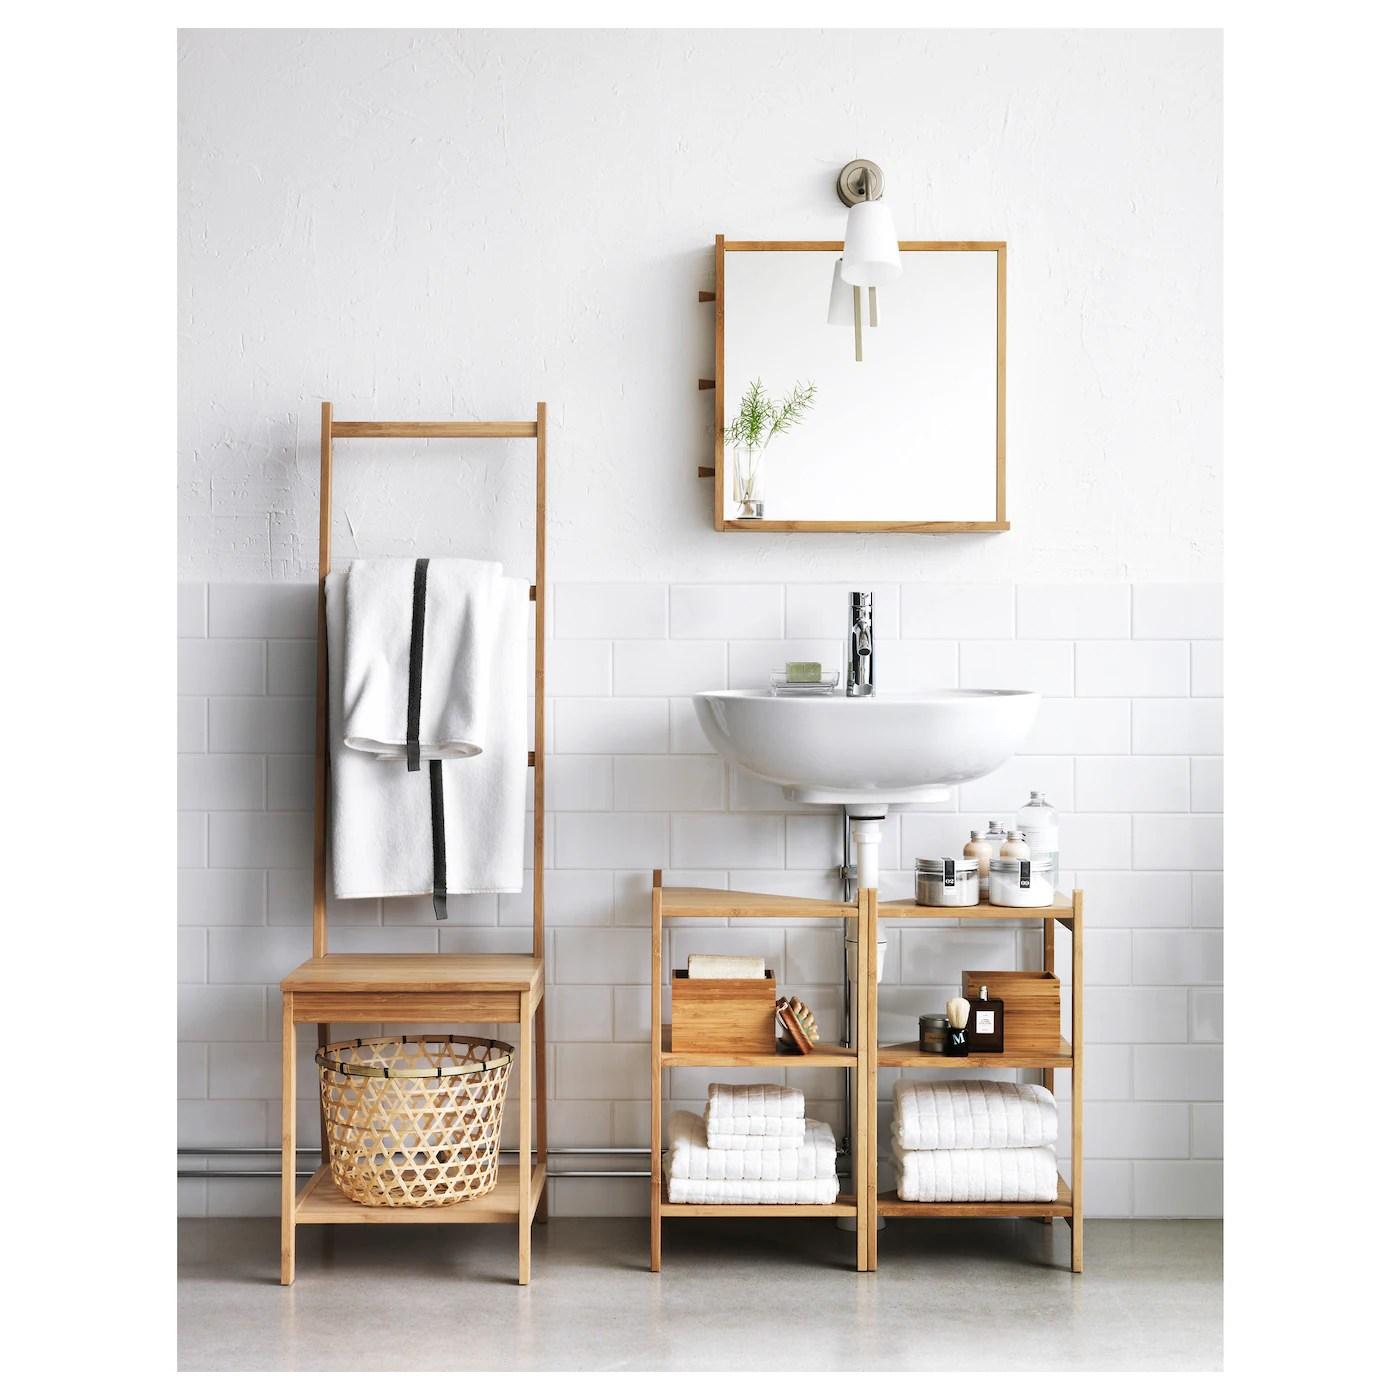 ragrund sink shelf corner shelf bamboo 13 3 8x23 5 8